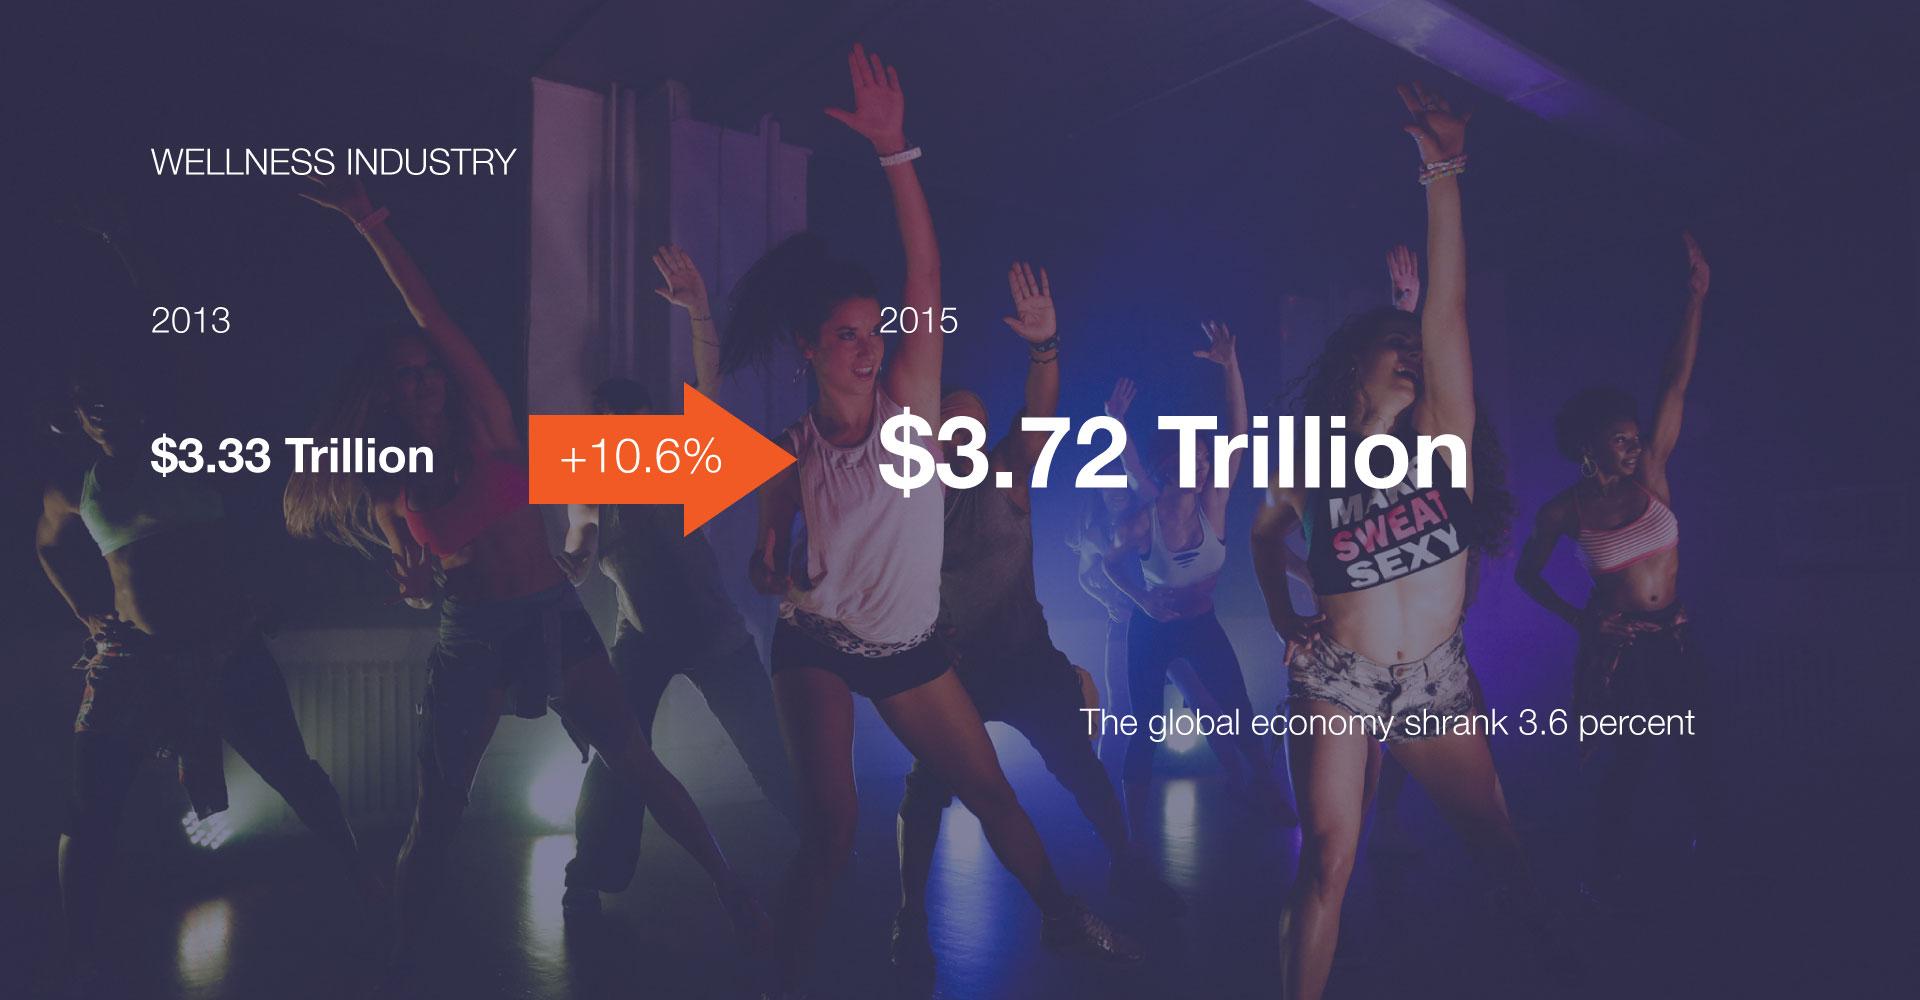 wellness-industry-grow.jpg